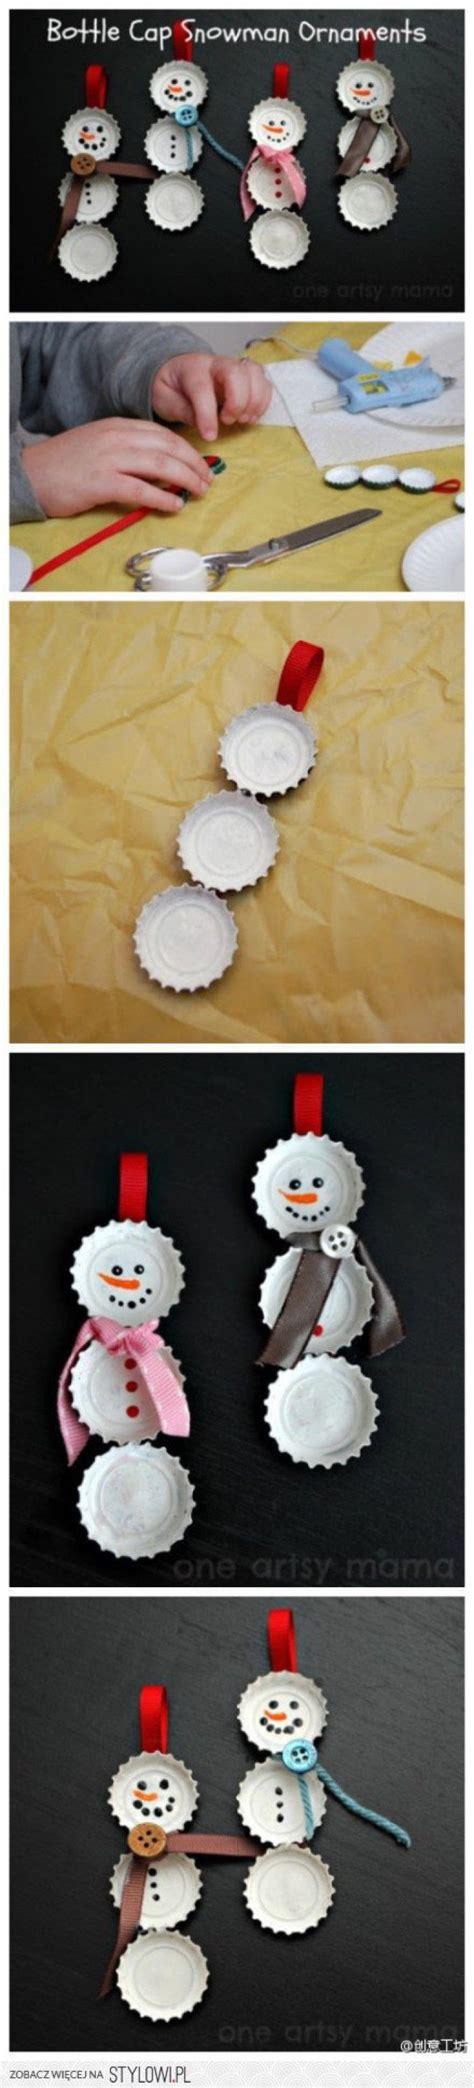 chrisymas nurse craft diy bottle cap snowmen ornaments pictures photos and images for